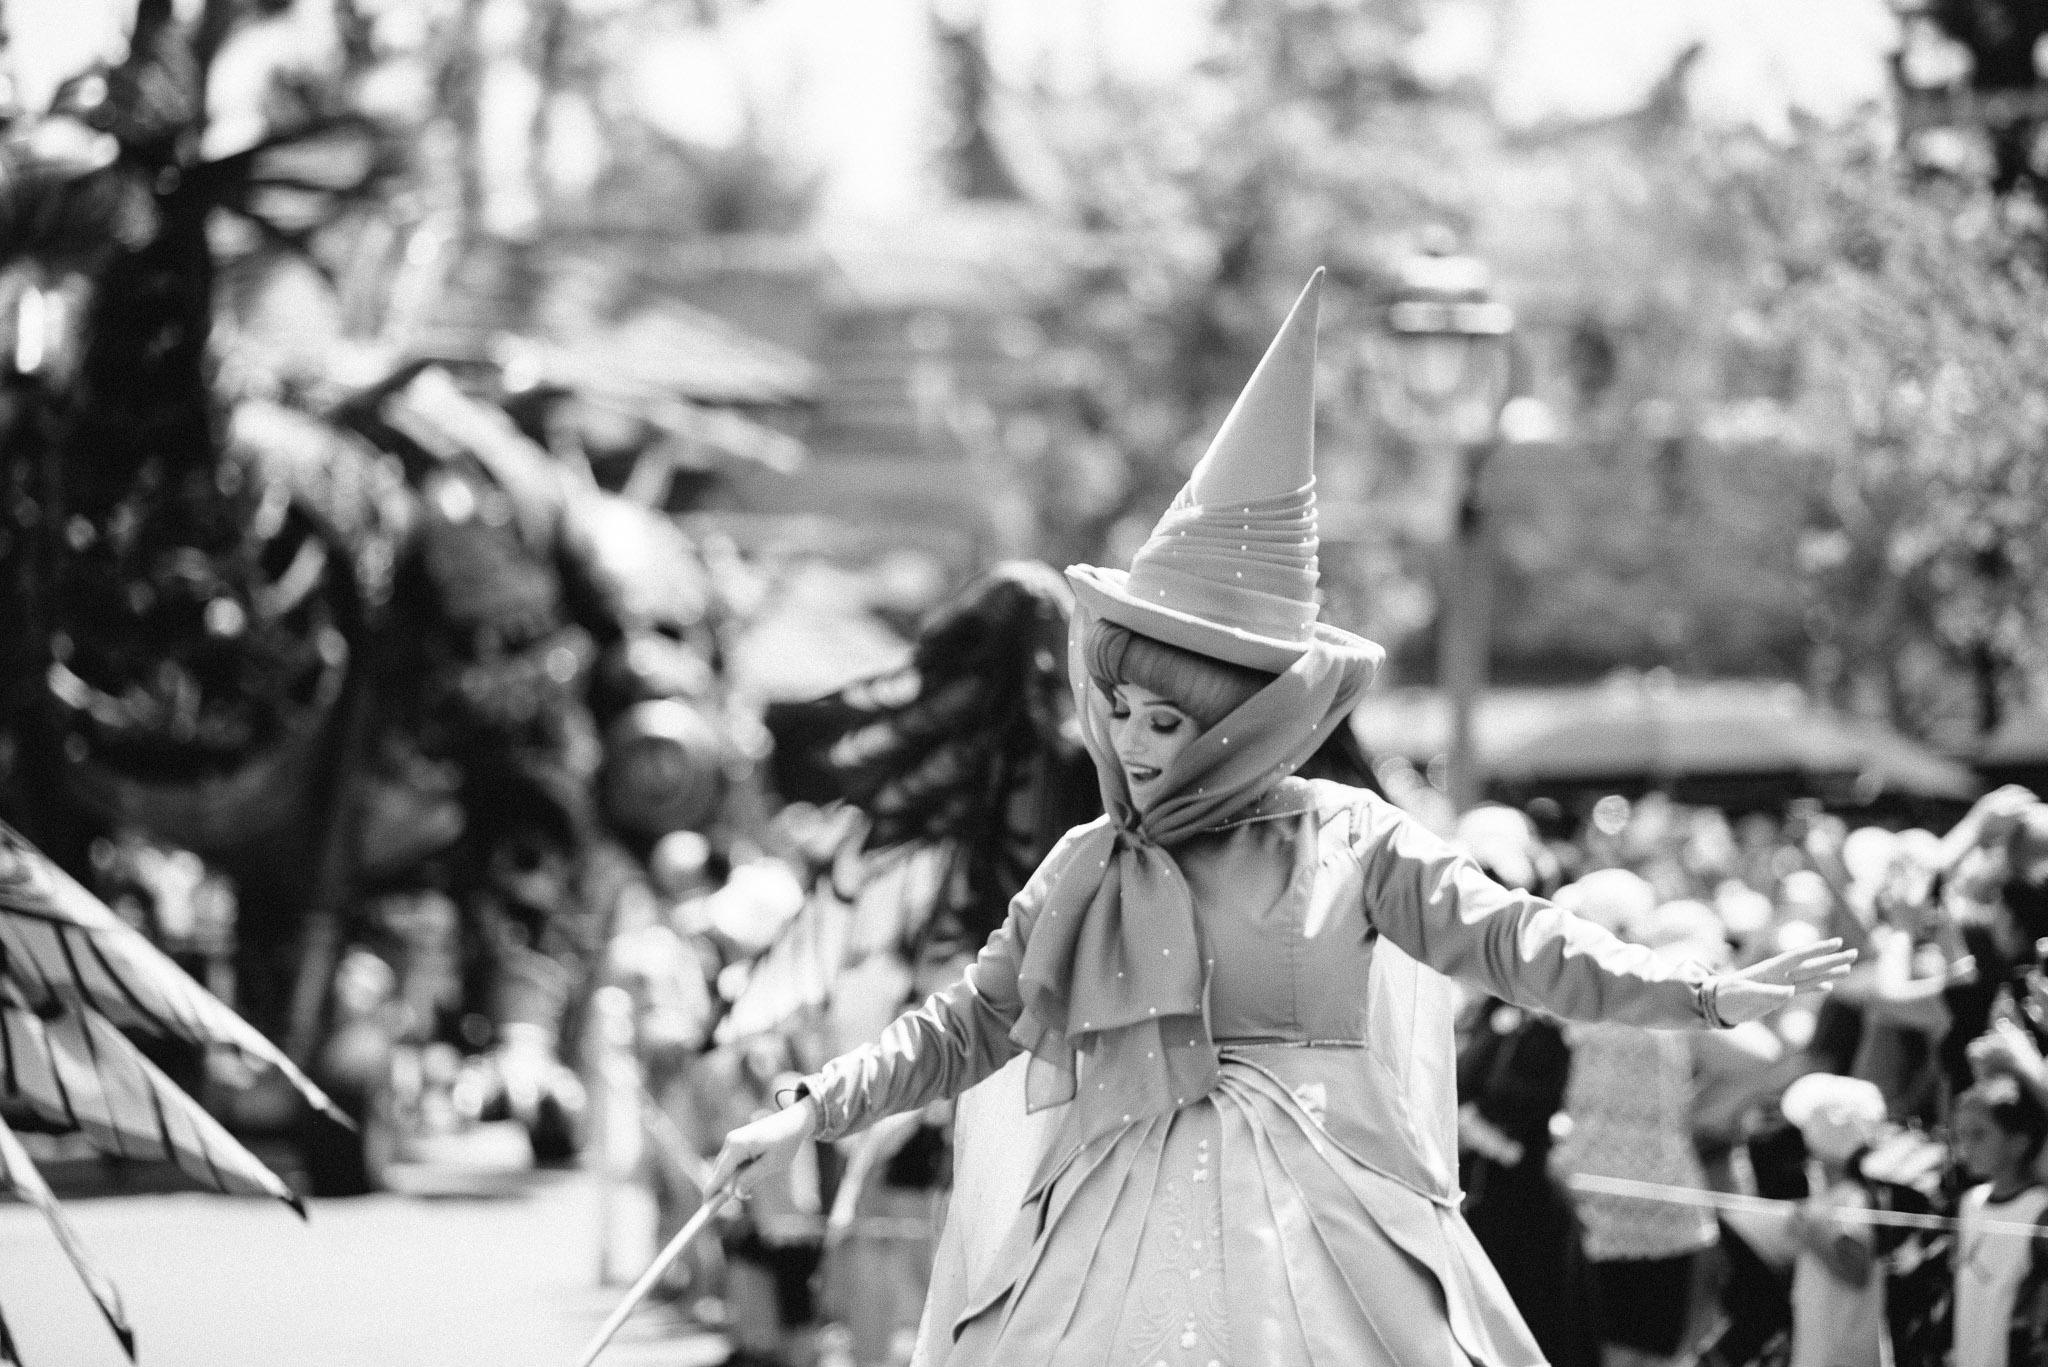 KateTaramykinStudios-Disney-World-Photographer-May-2017-18.jpg